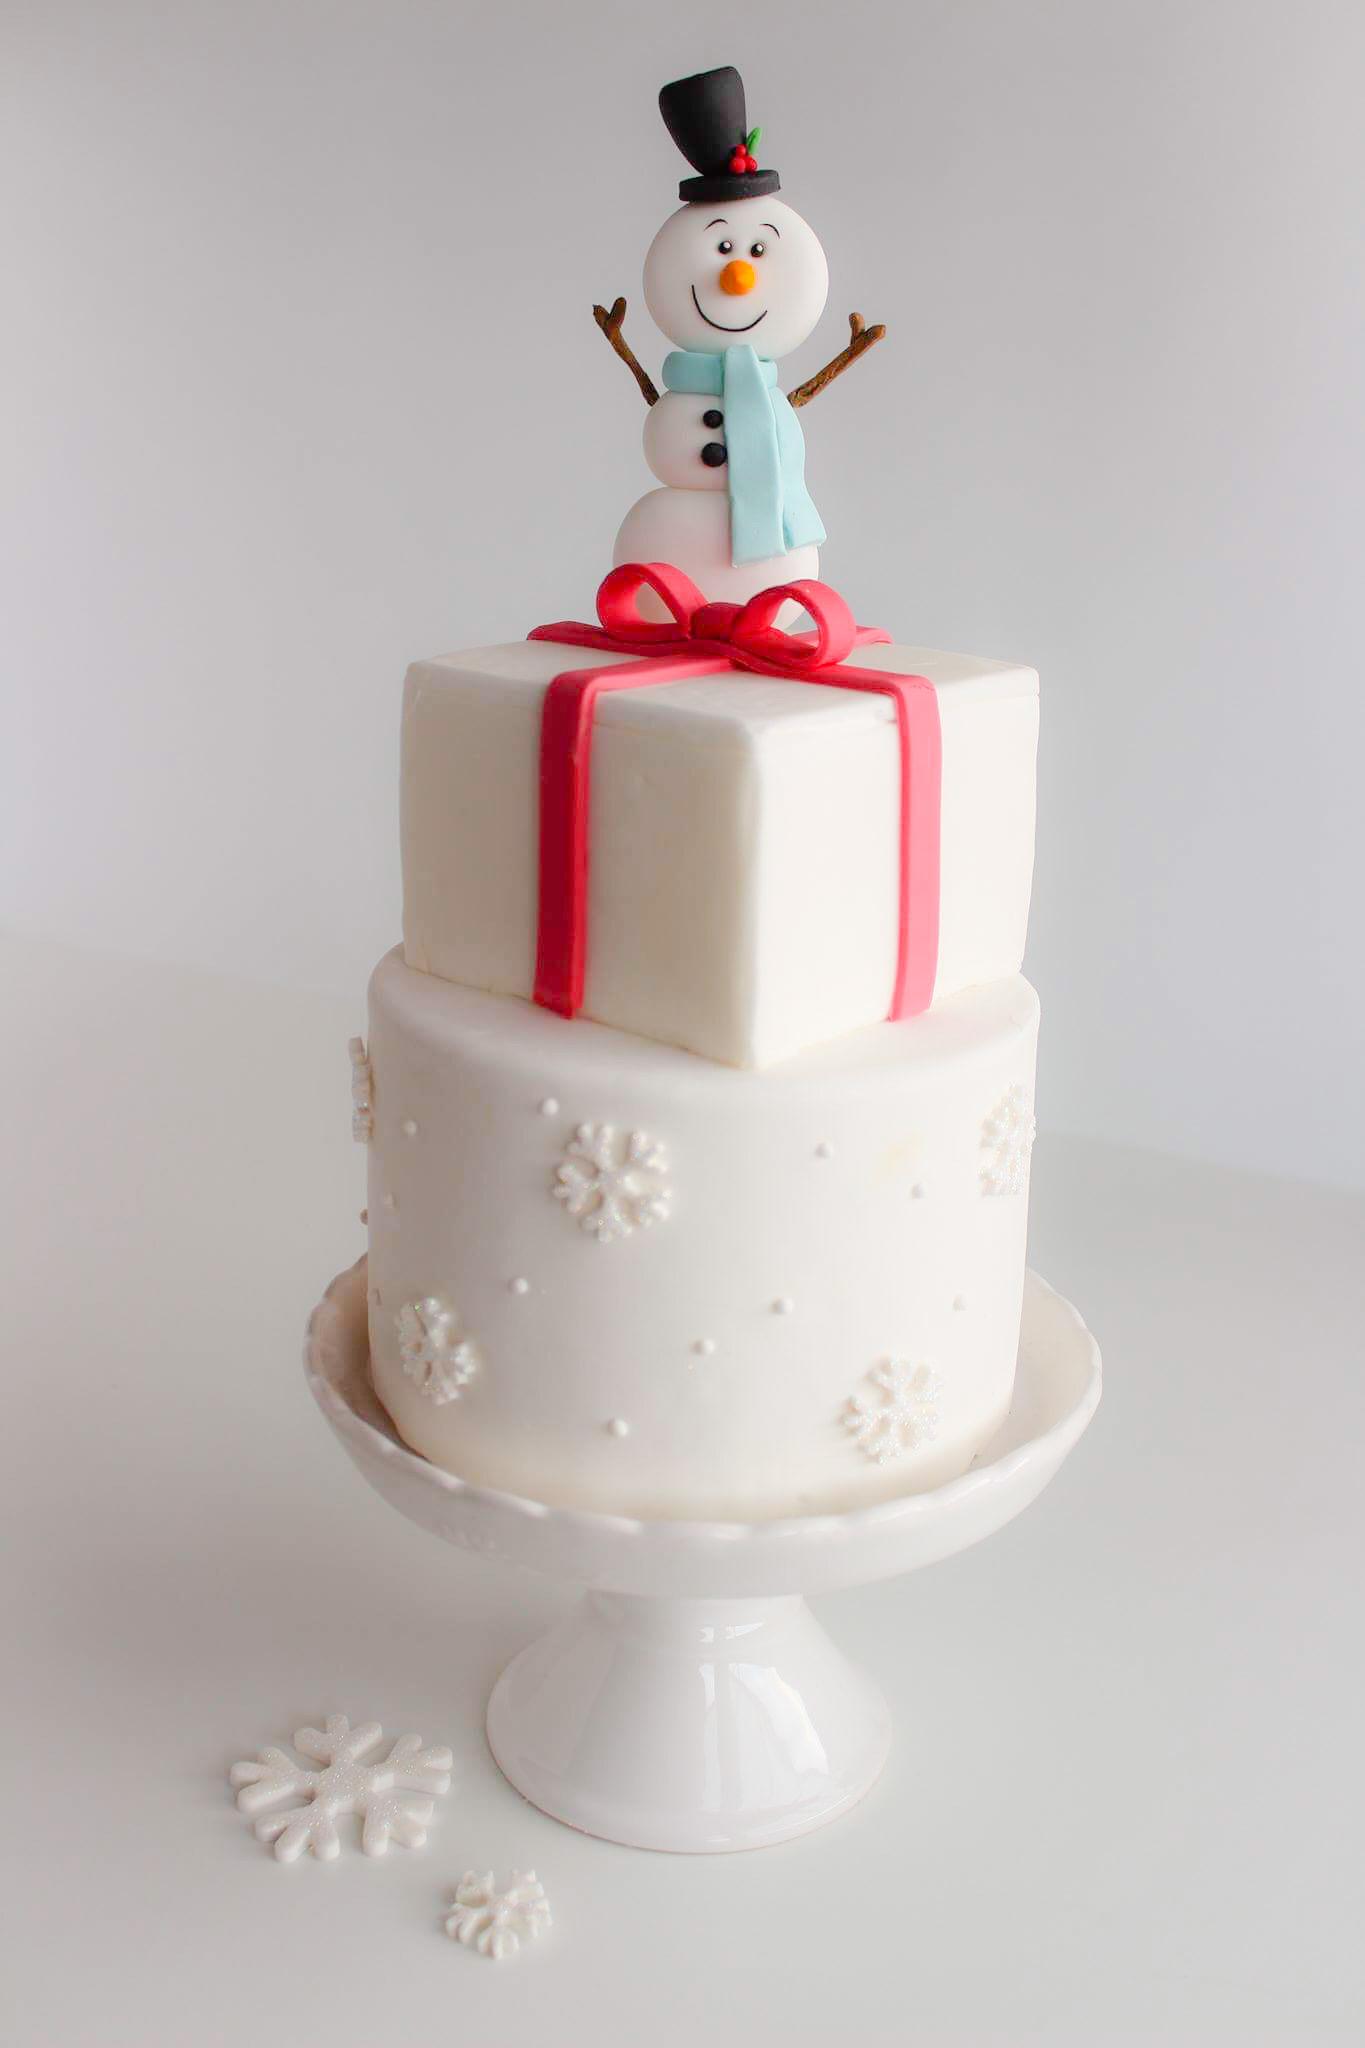 Winter snowman birthday cake